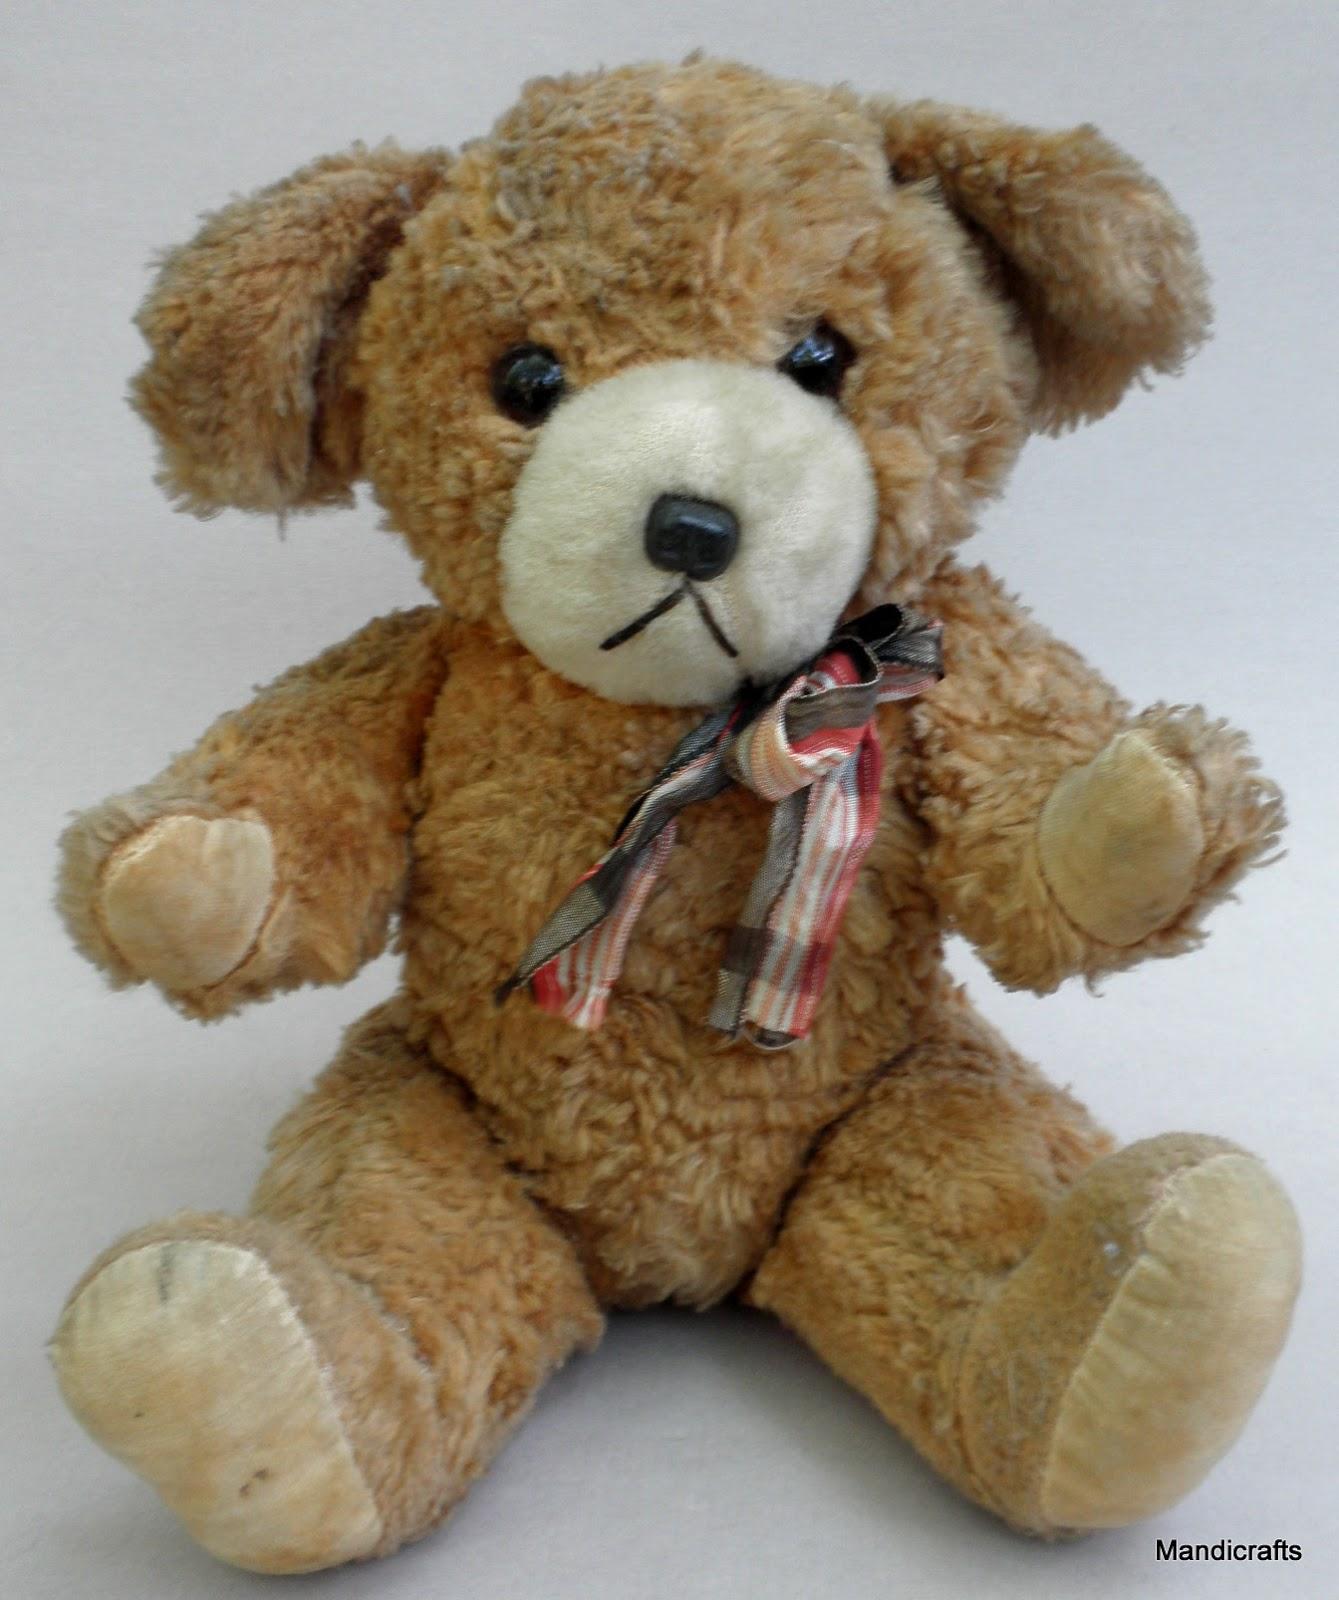 Mandicrafts News Amp Views Teddy Bears Amp Collectibles